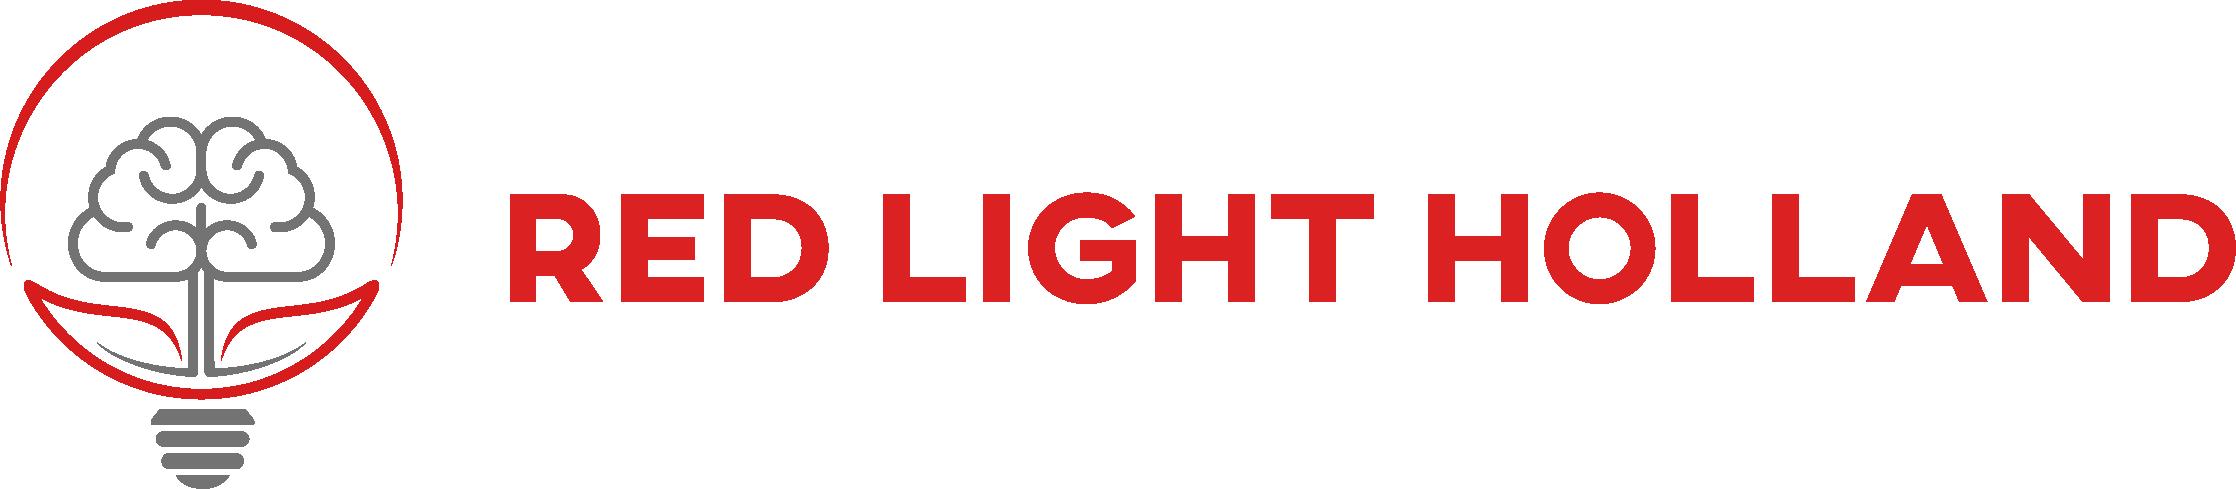 Red Light Holland logo